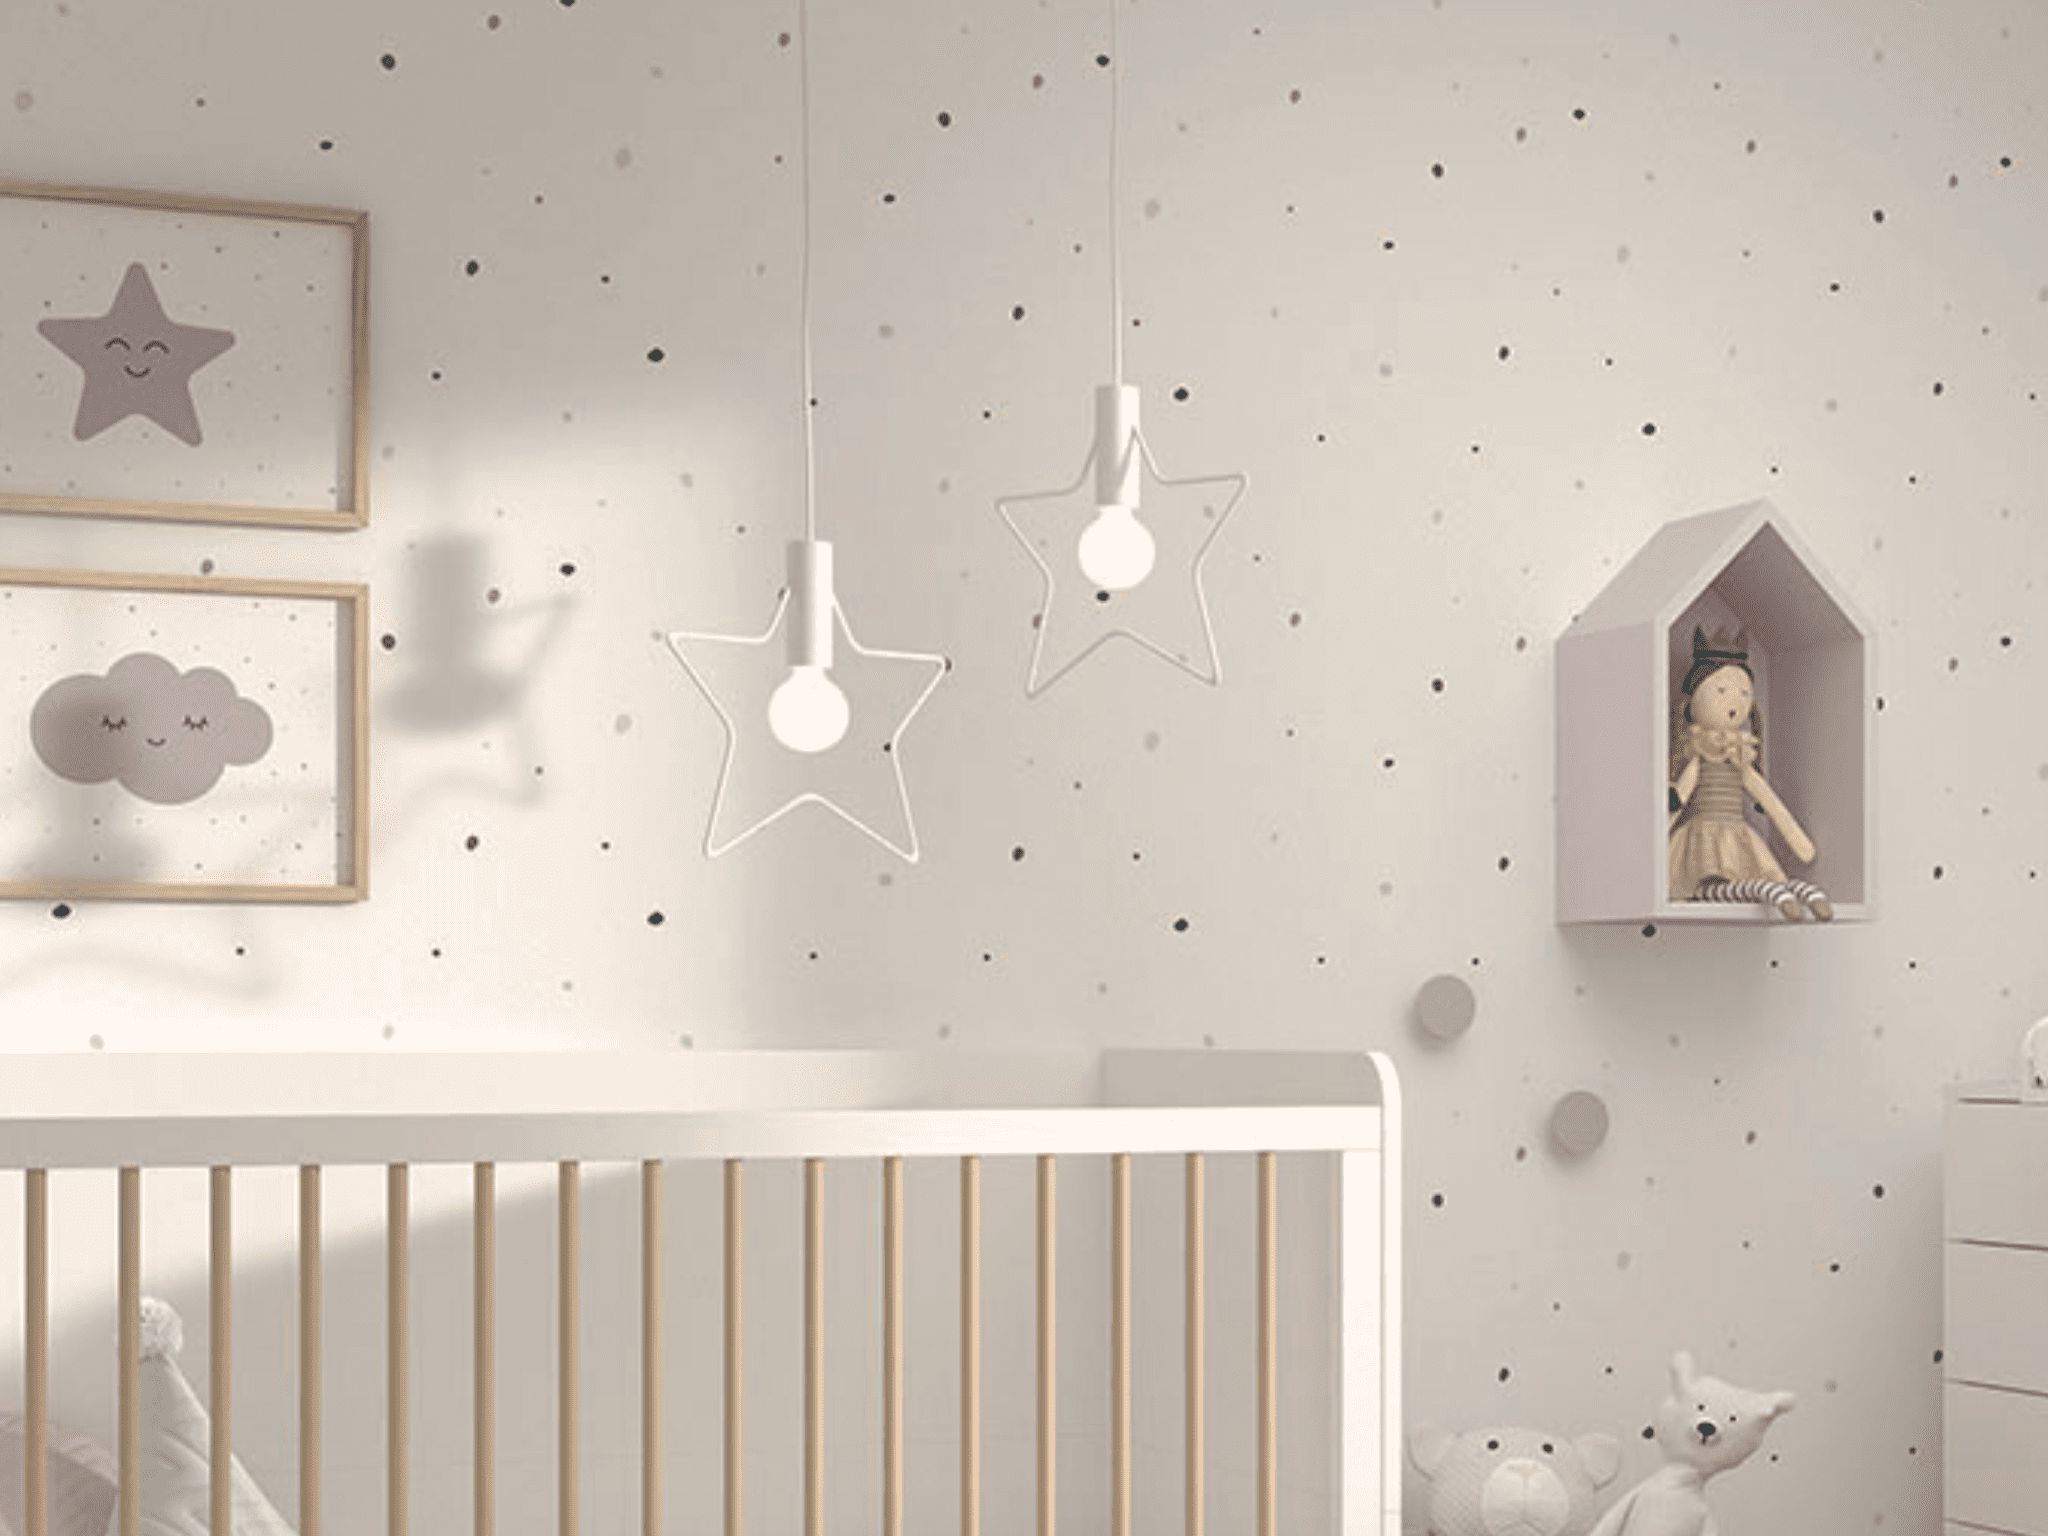 Papel pintado decorativo DOTS MINI COMBI fondo  blanco dots colores